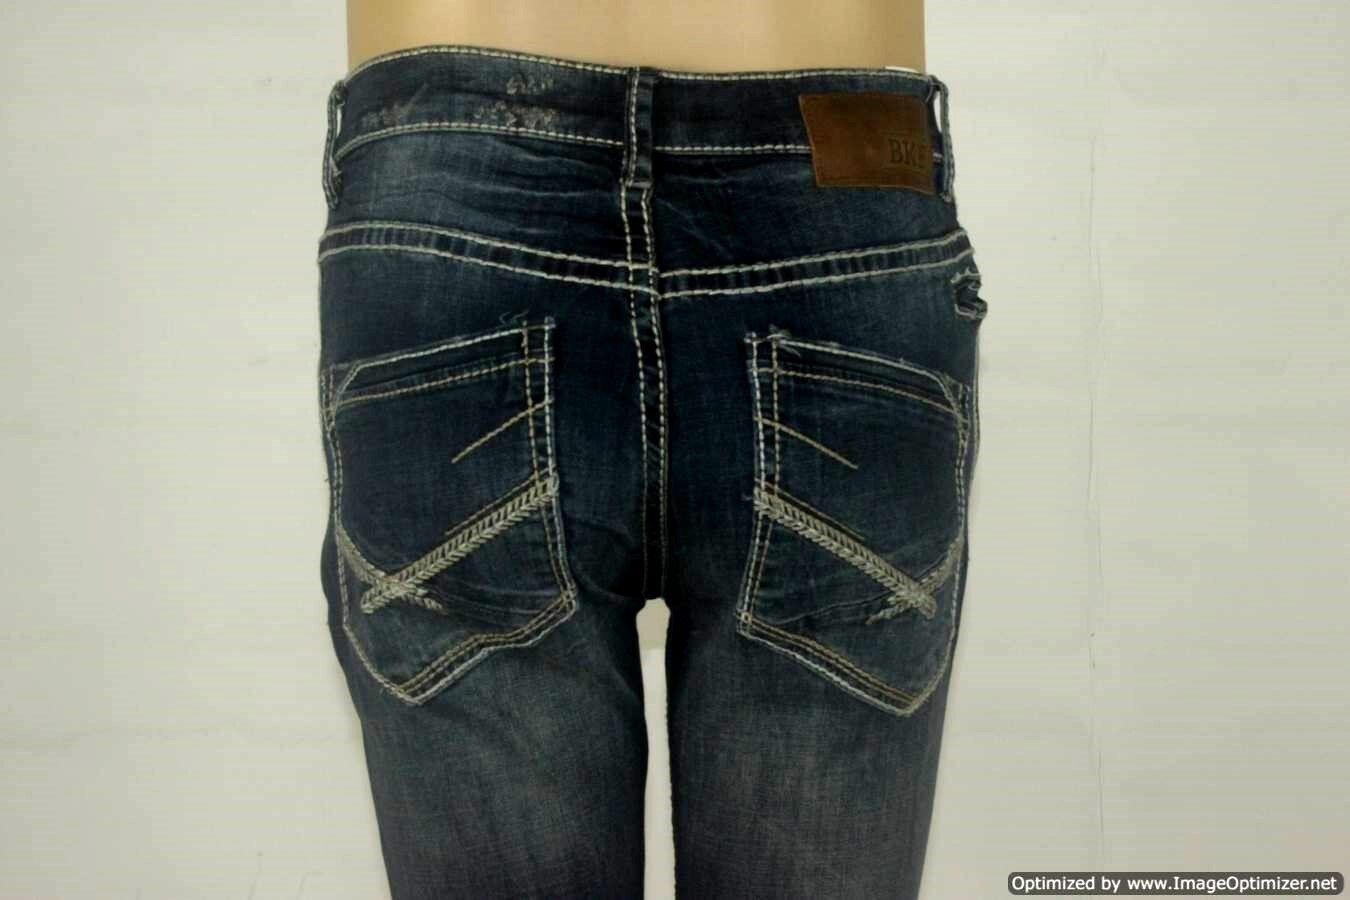 BKE Denim Jeans - AIDEN Slim Fit Bootcut - Stretch  - Size 27R - W  27 x L  33